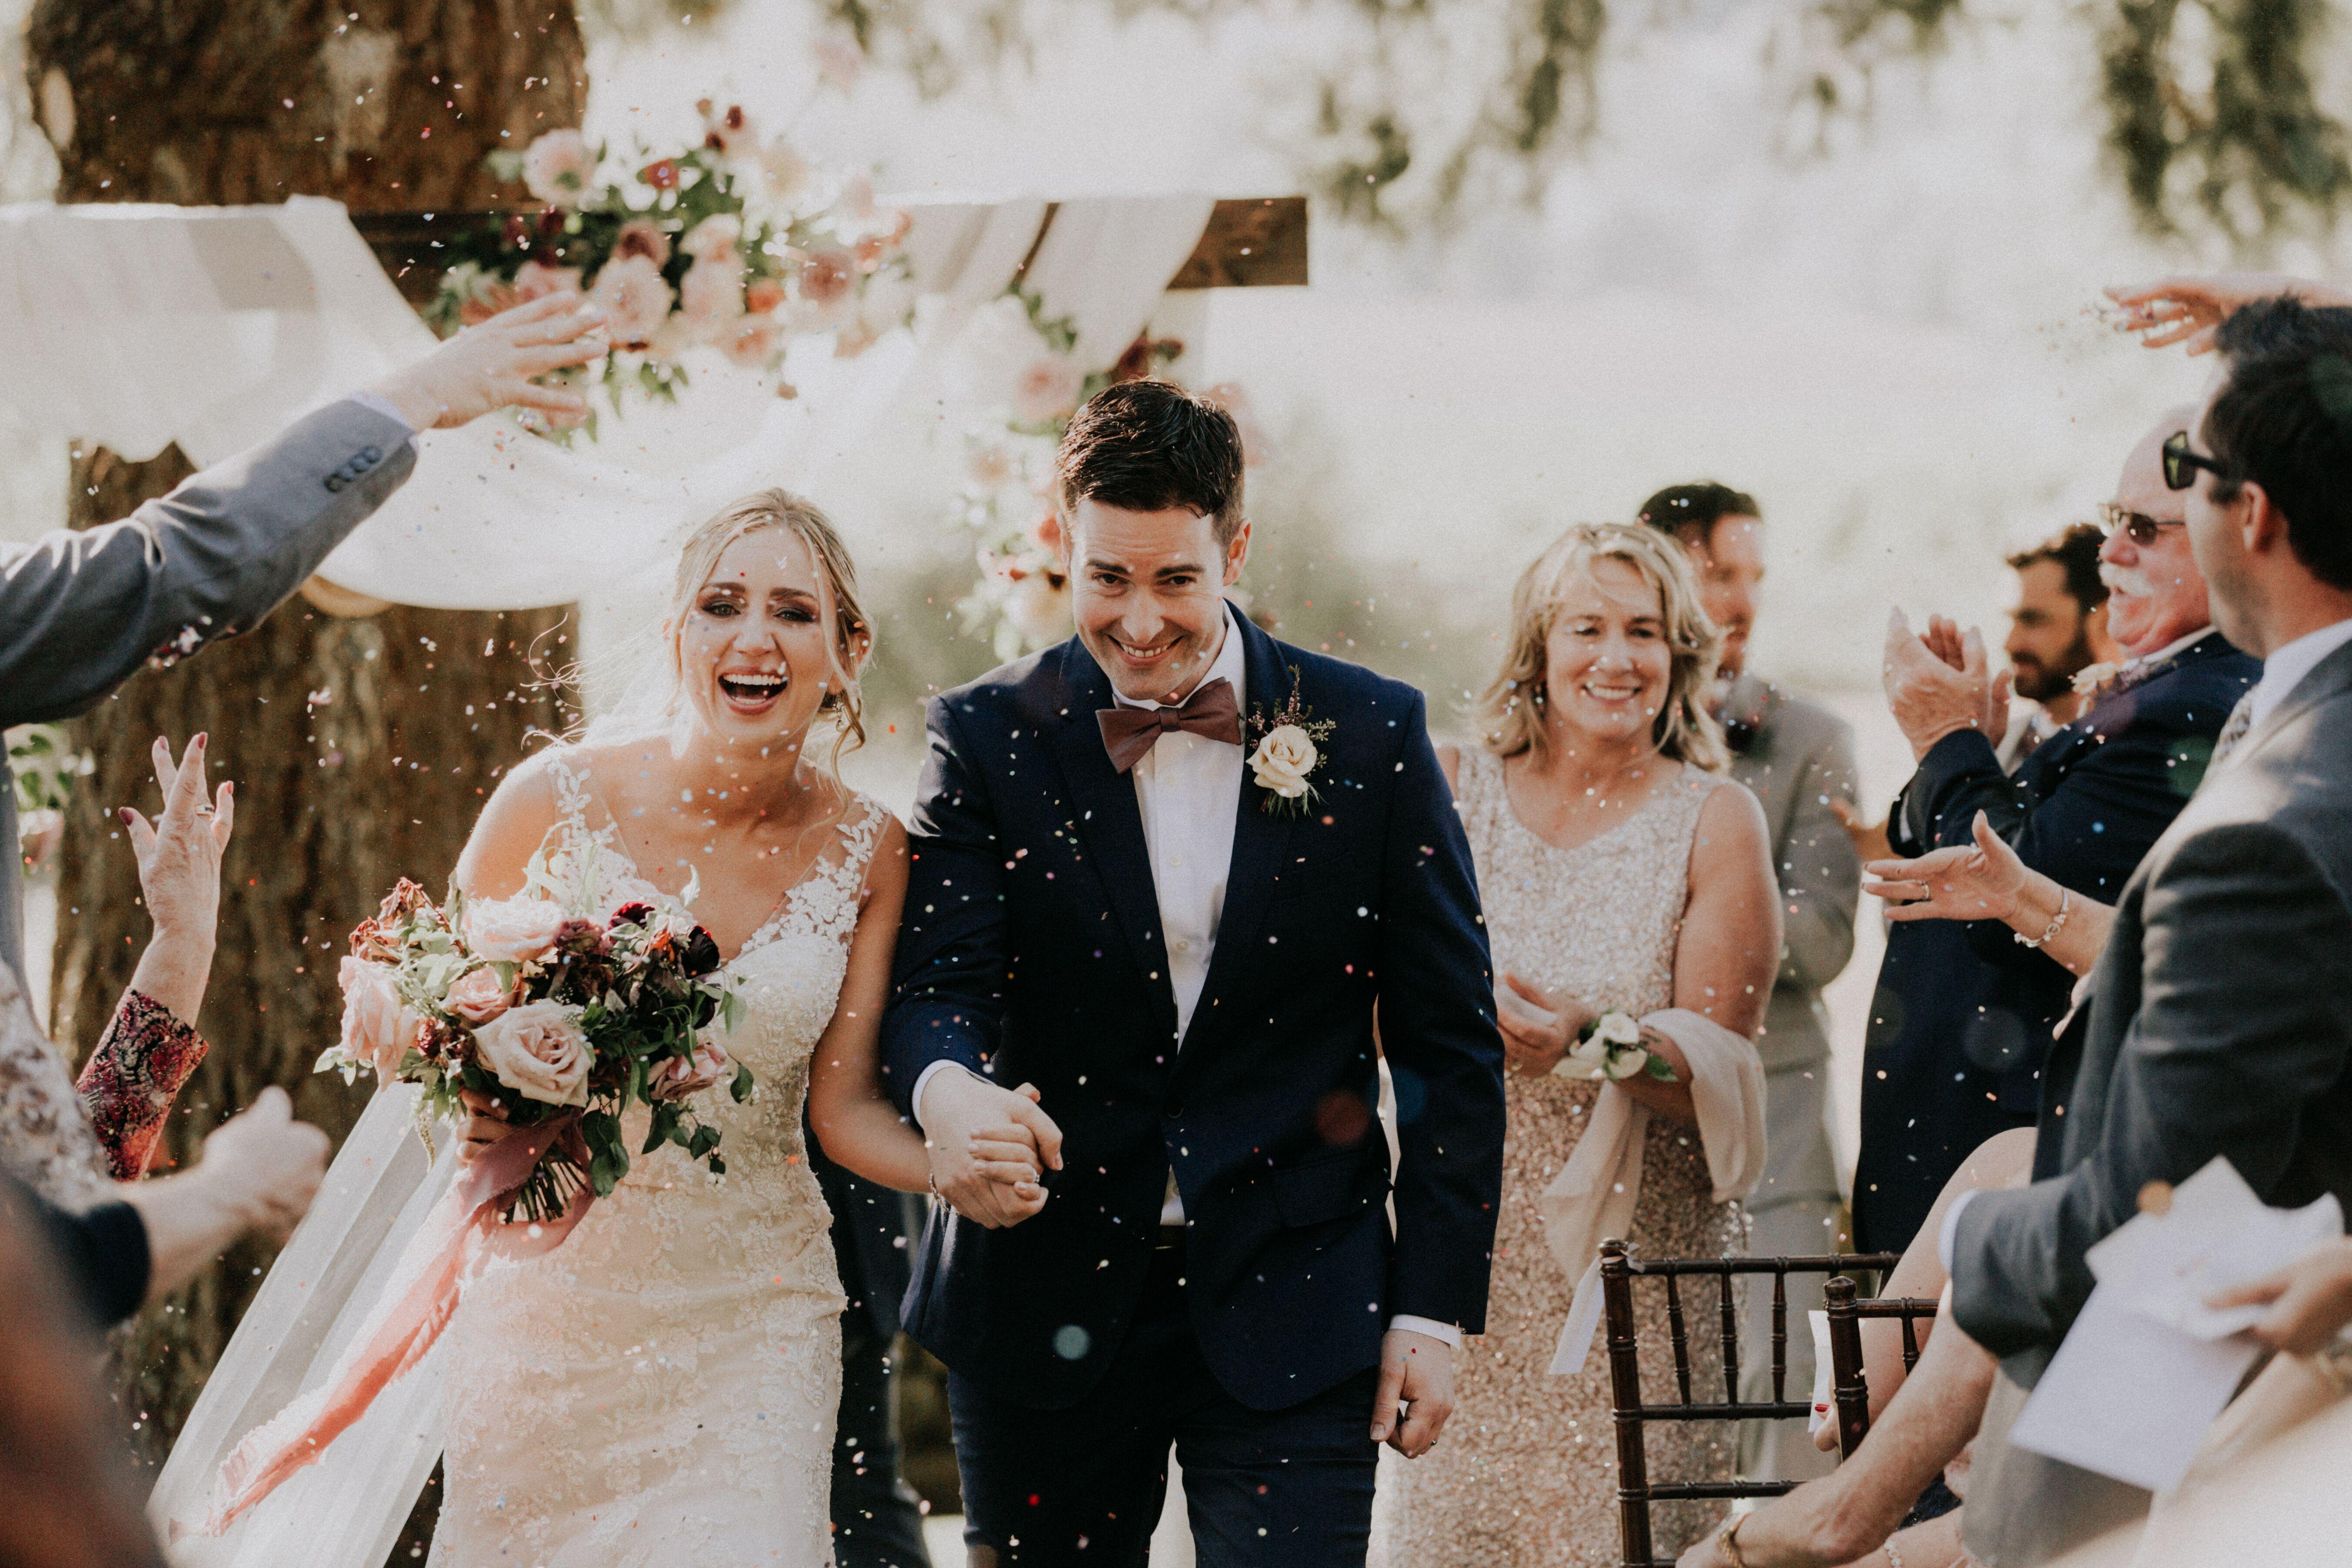 Pin on Dream Wedding Ideas